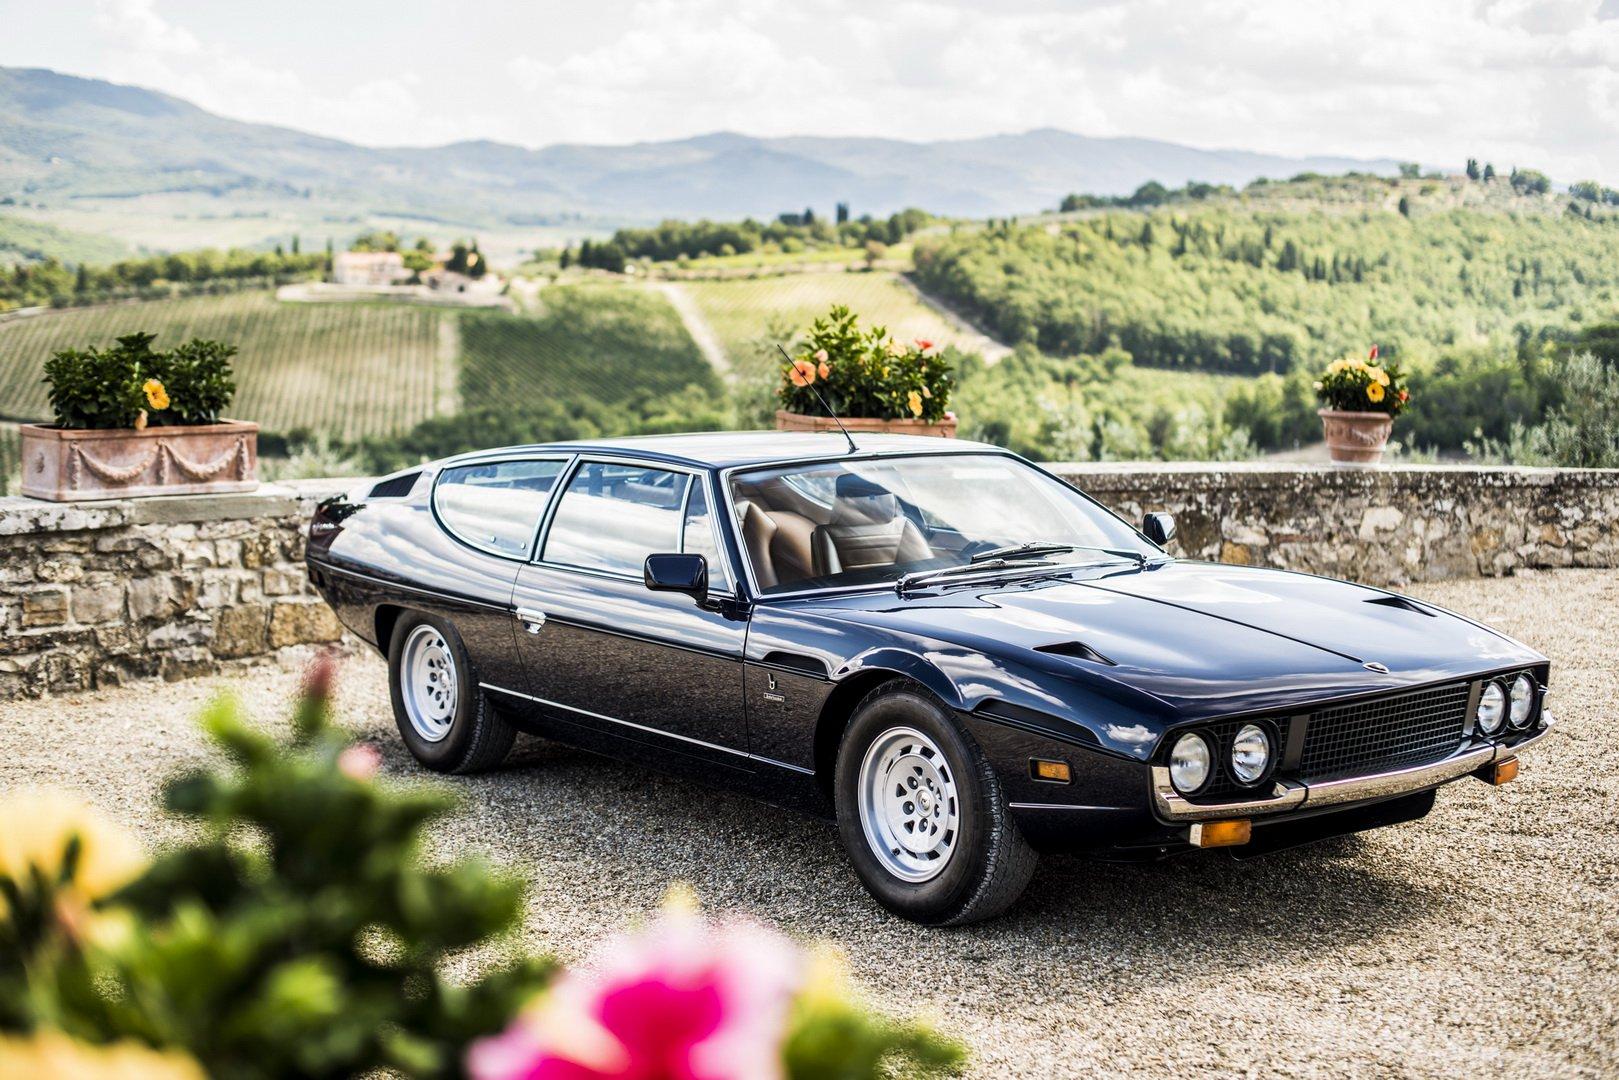 Lamborghini Islero and Espada 50th anniversary (18)